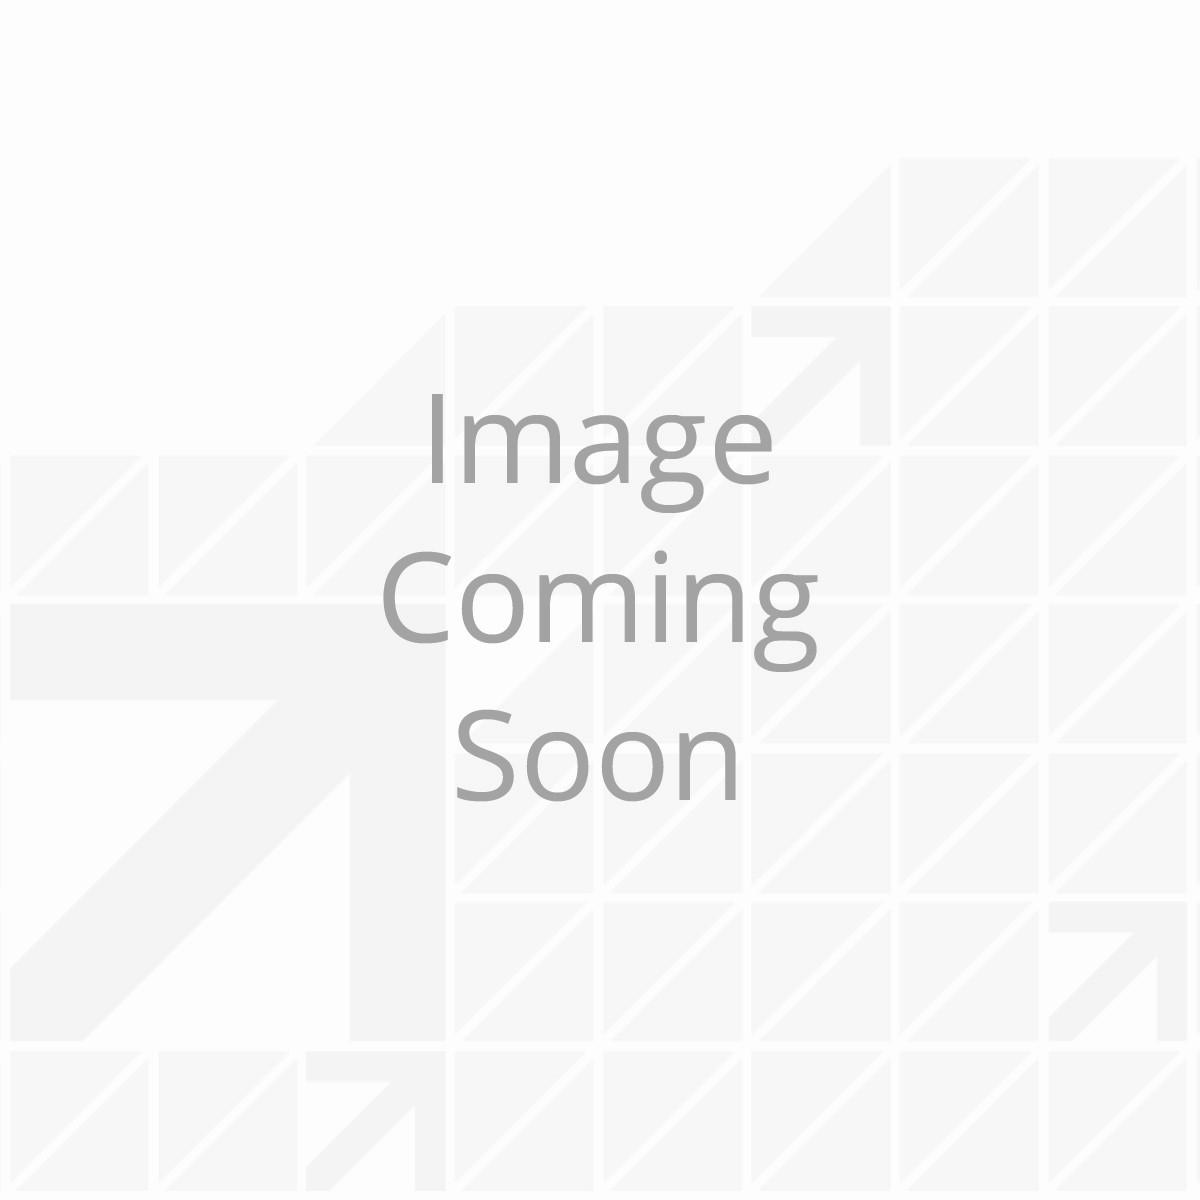 SuperFlex Patch Kit, Beige (6.0 SqFt)